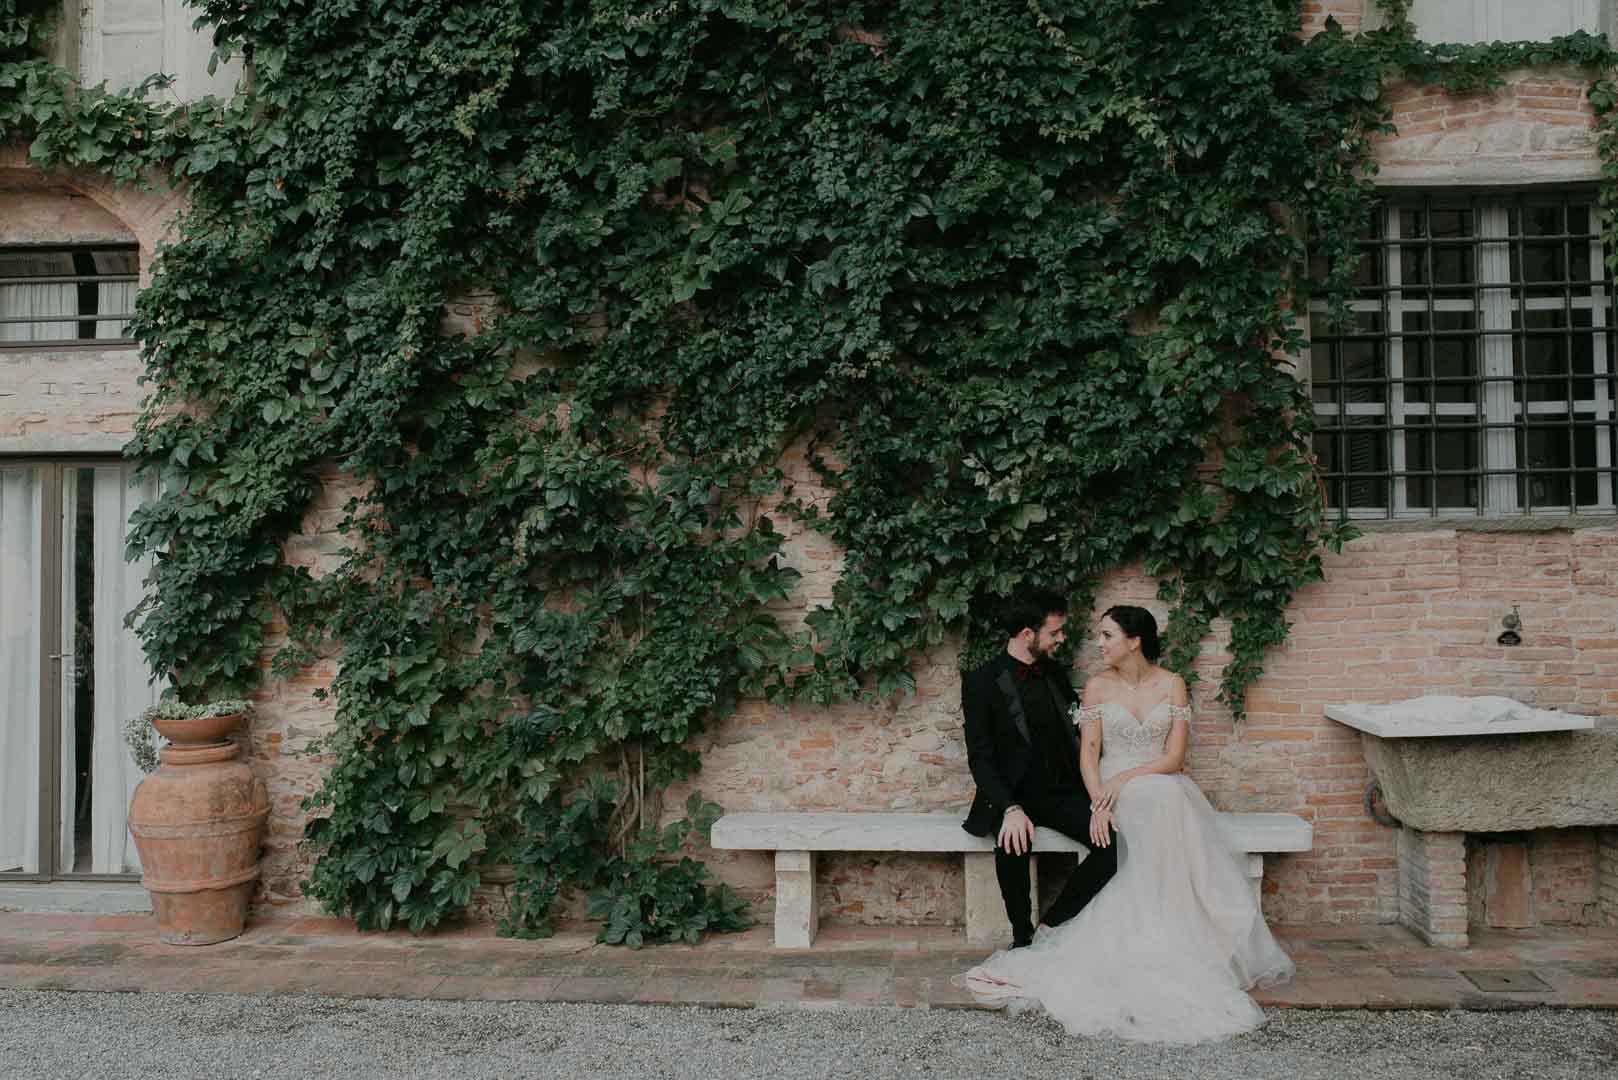 wedding-photographer-destination-fineart-bespoke-reportage-tuscany-villascorzi-vivianeizzo-spazio46-112